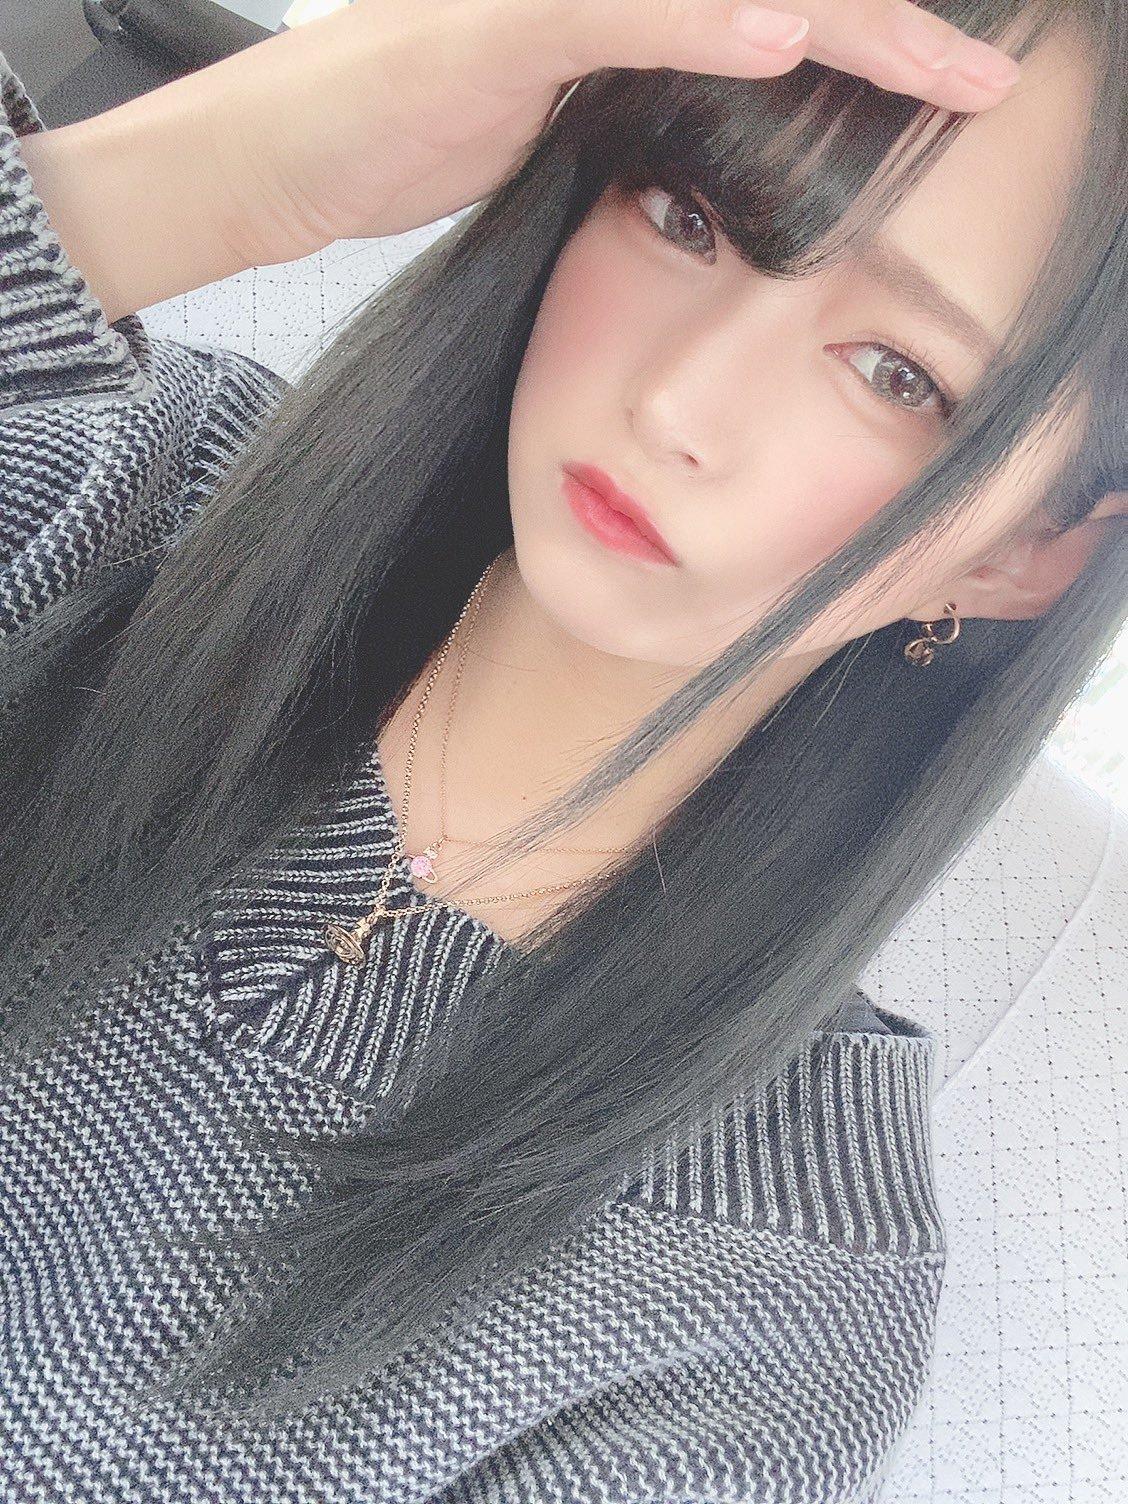 nagisa_micky 1249661571384504321_p3